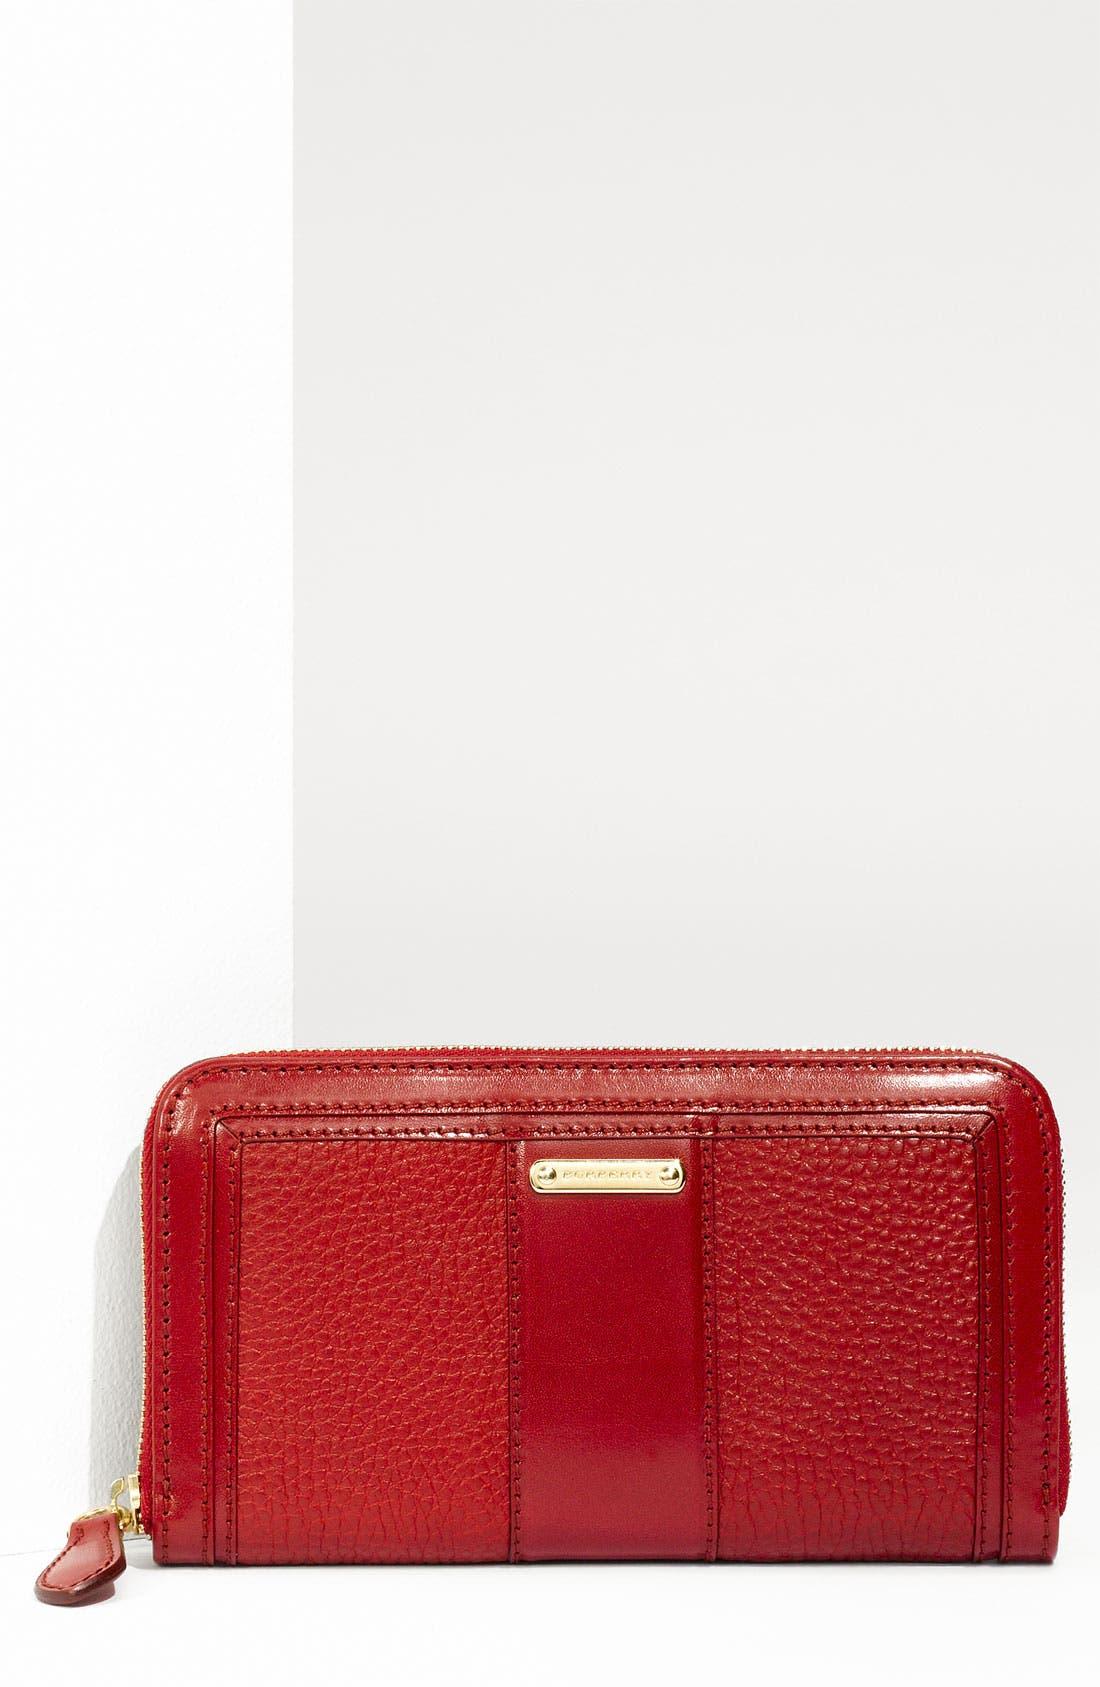 Alternate Image 1 Selected - Burberry Zip Around Wallet